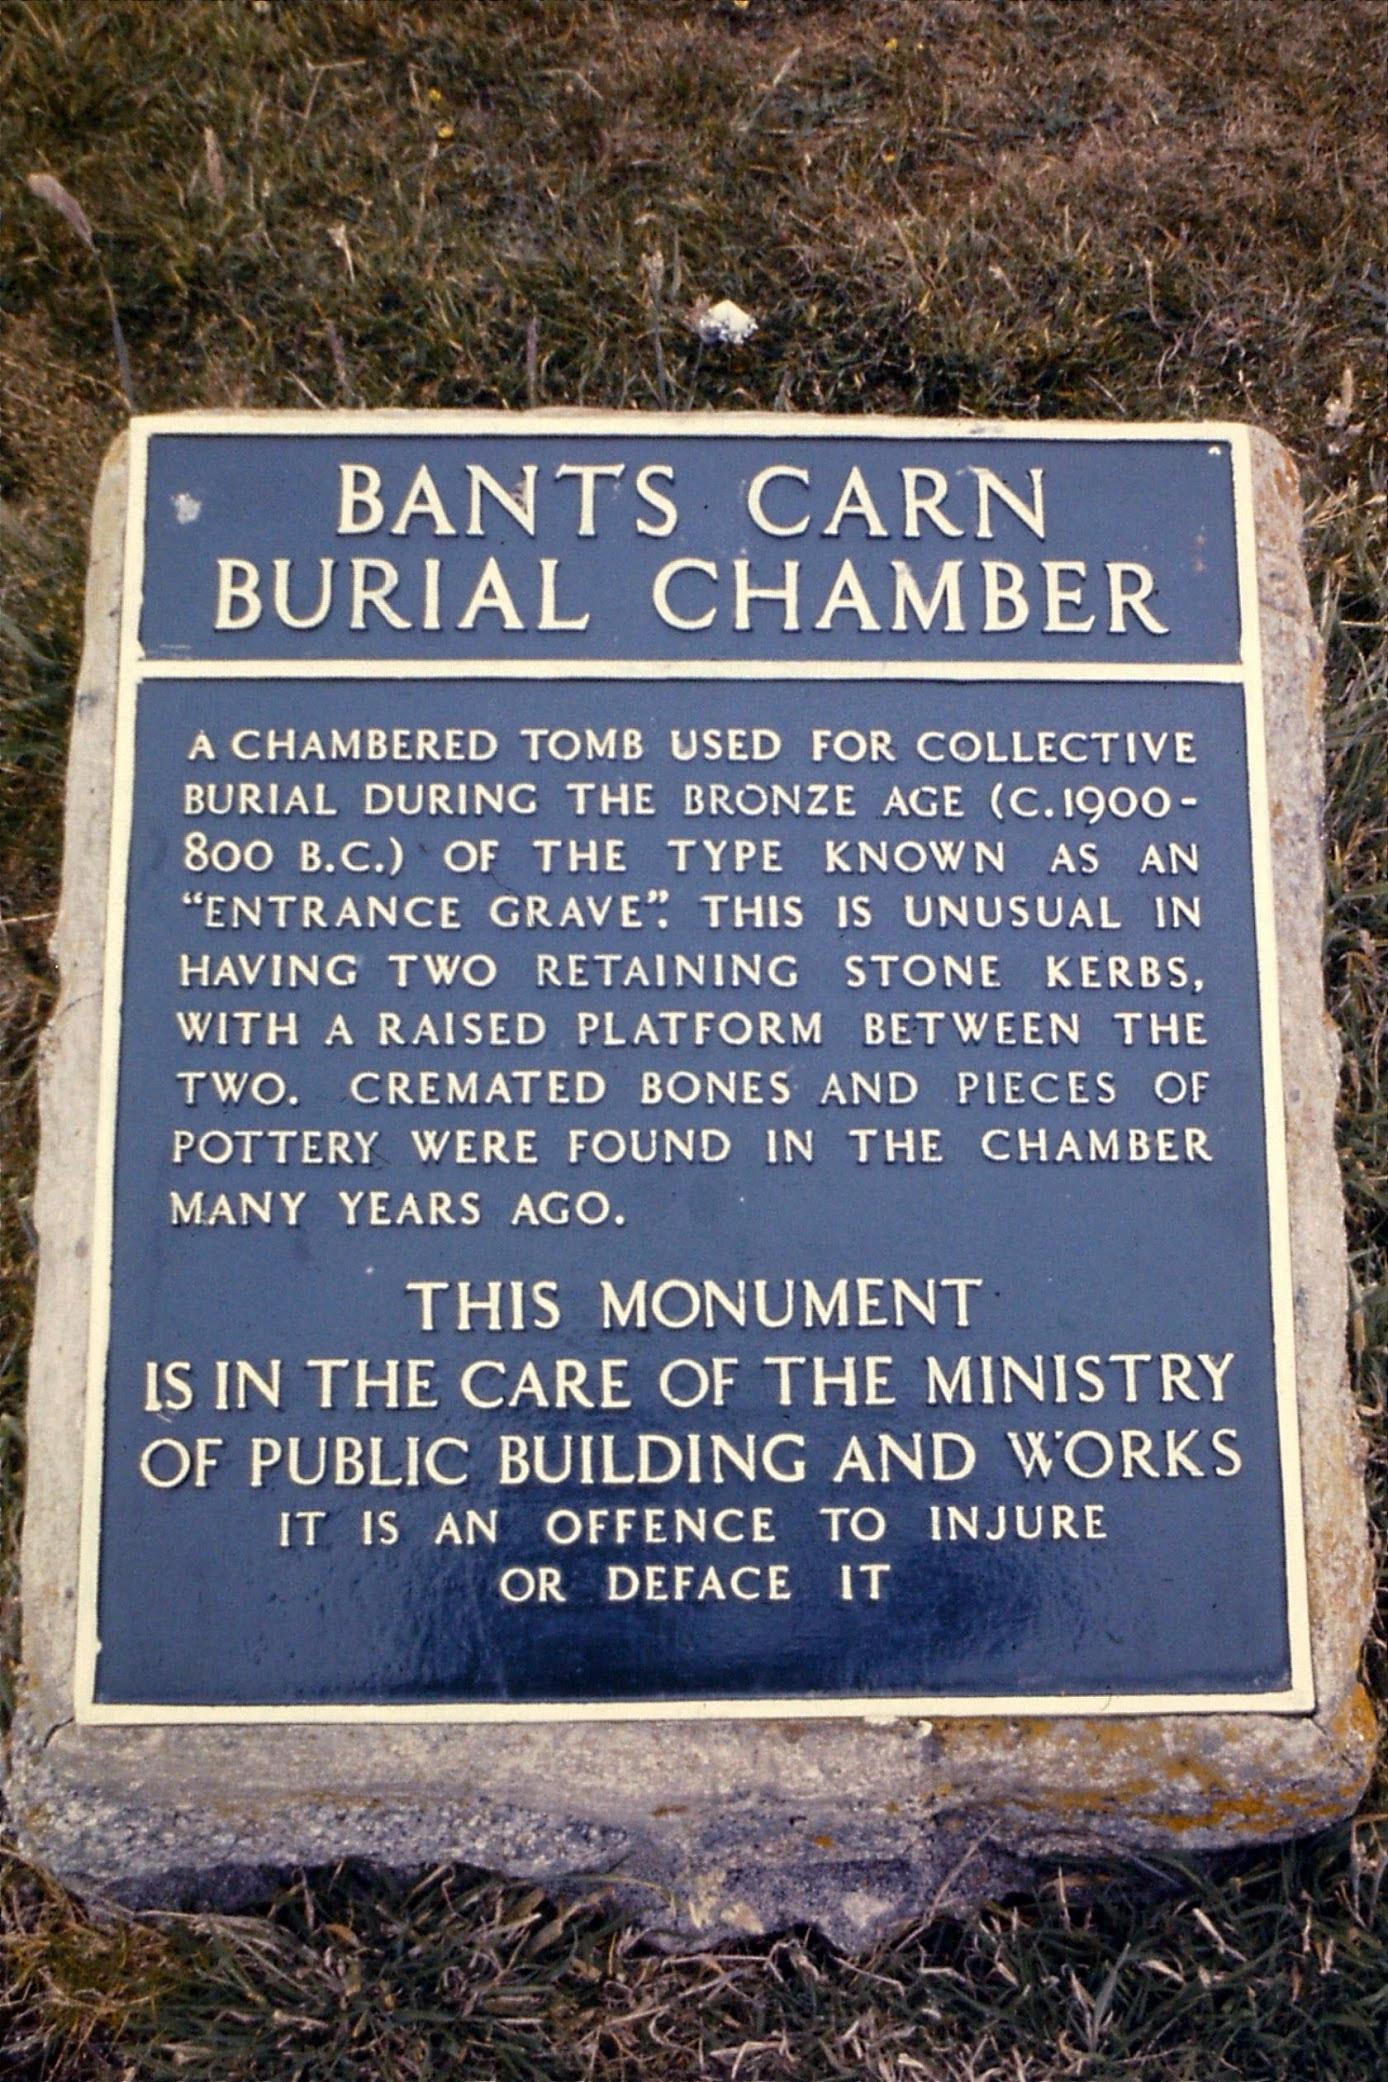 Bants_Carn_sign